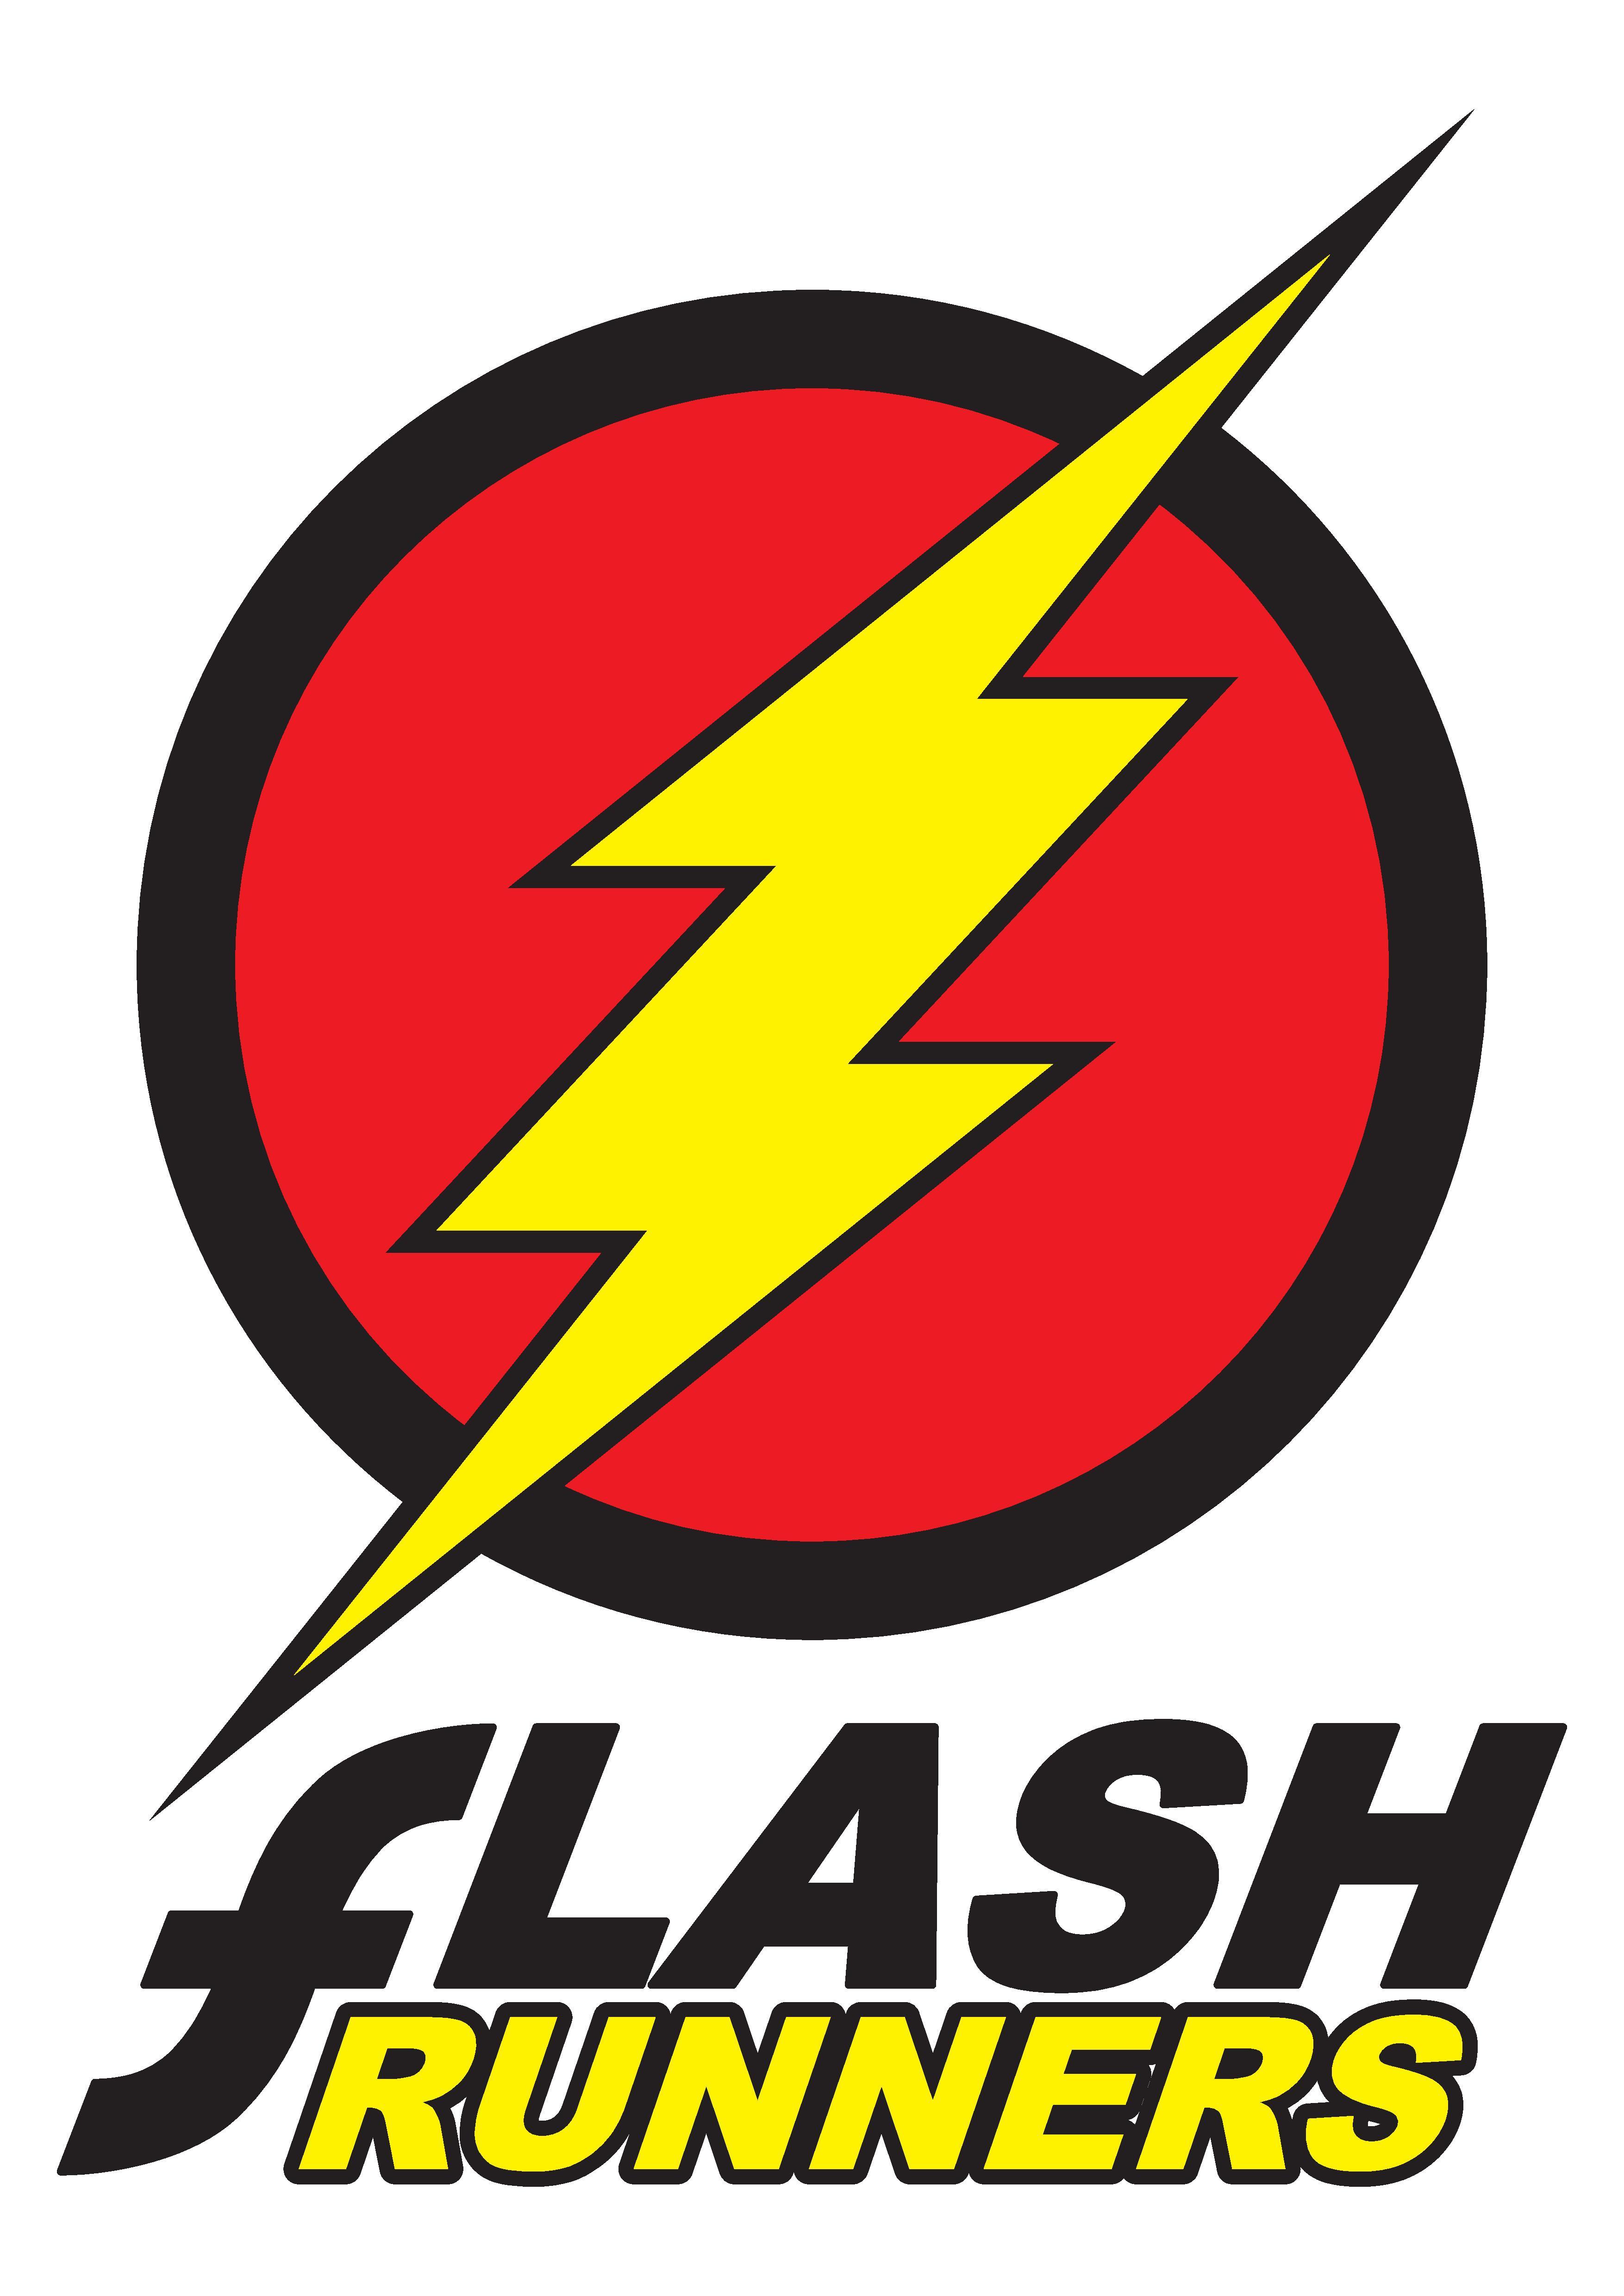 /images/com_odtatierkdunaju/teams/2021_Flash-runners.jpg